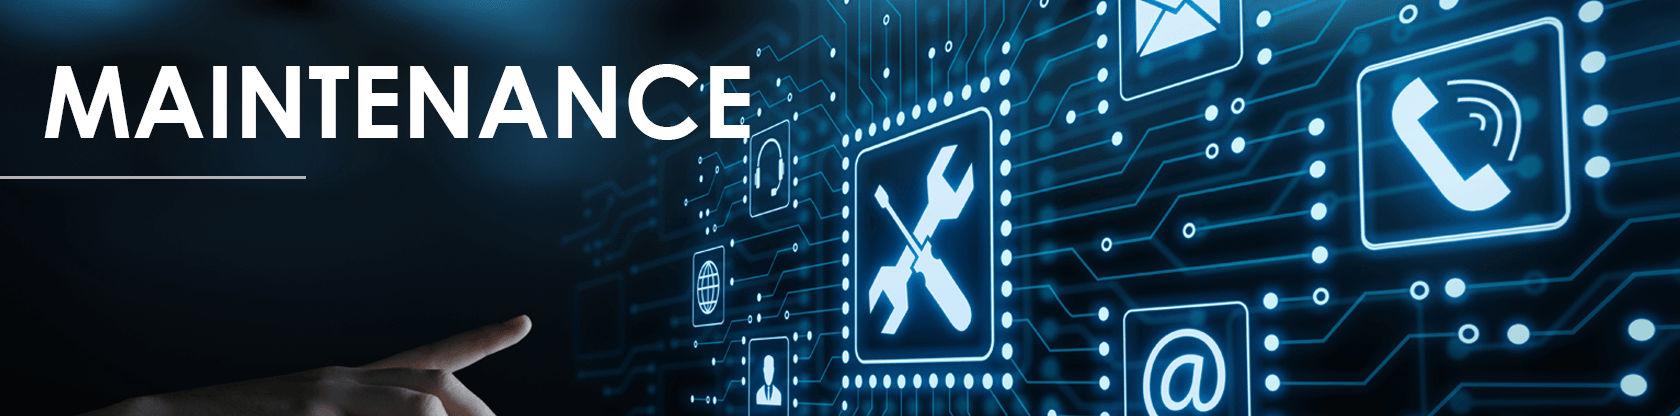 maintenance terminaux Datalogic